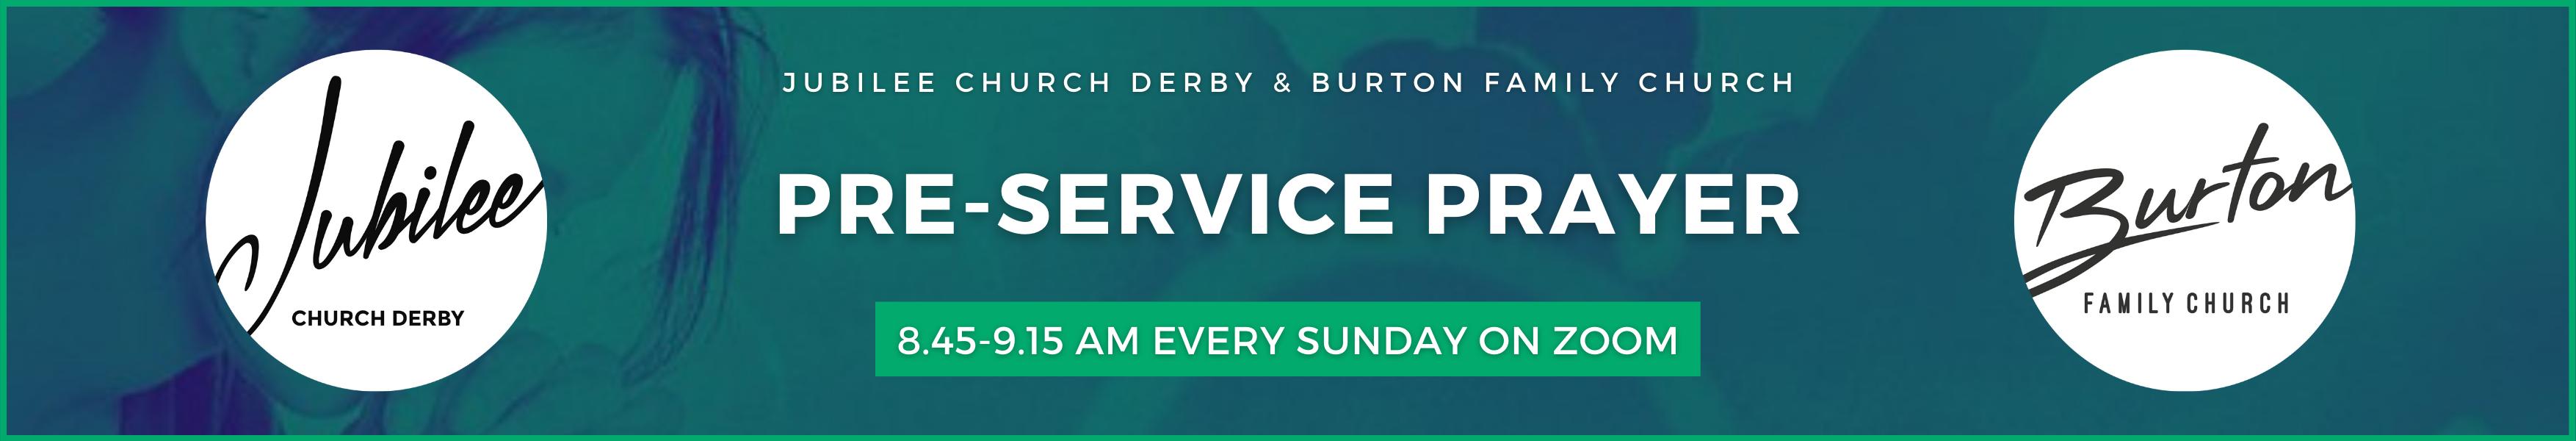 Pre-Service Prayer Meetings